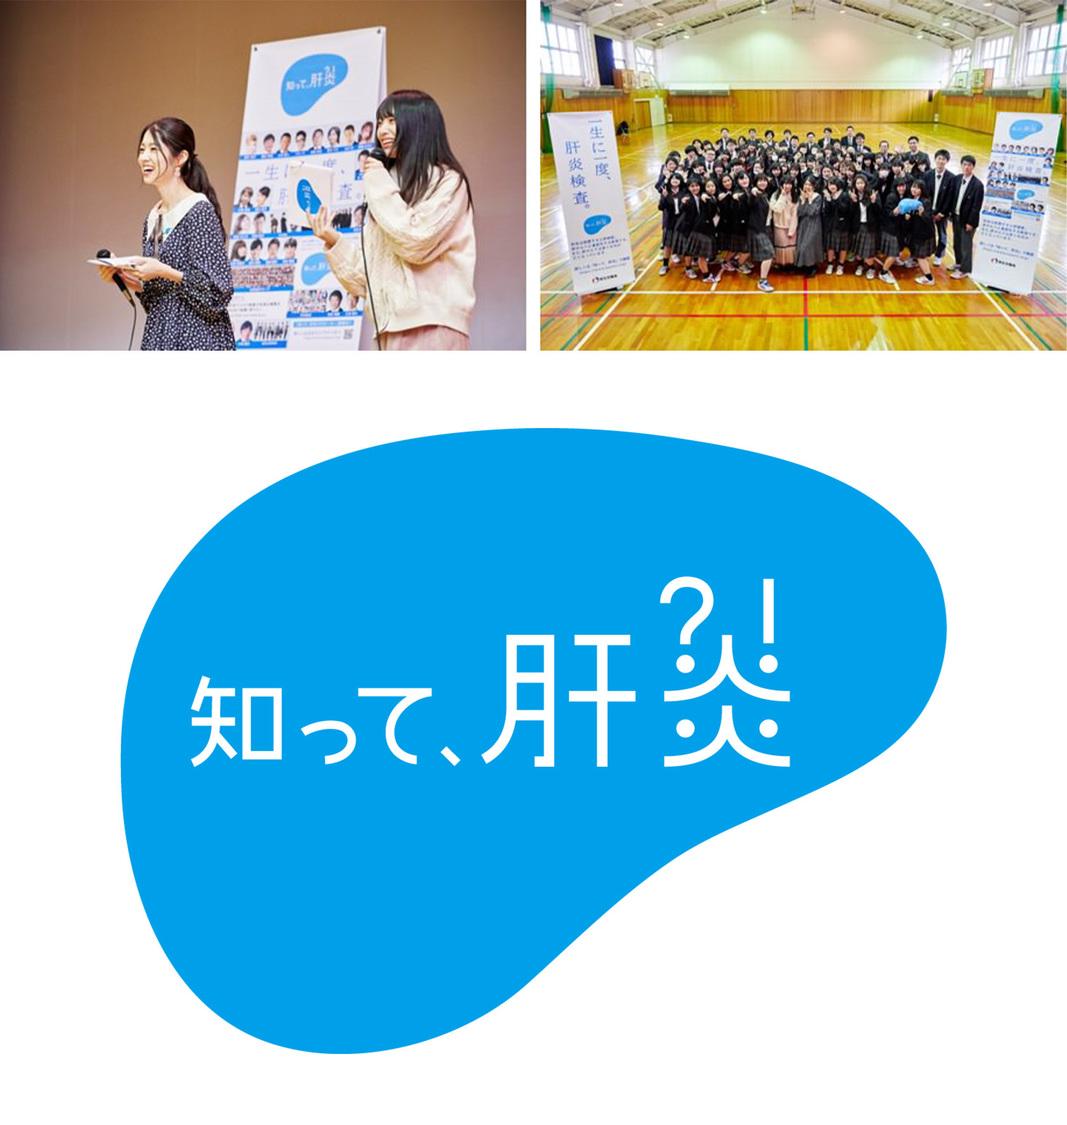 AKB48 岩立沙穂・久保怜音、肝炎特別授業実施!「一生に一度、肝炎ウイルス検査を受けてほしいです」